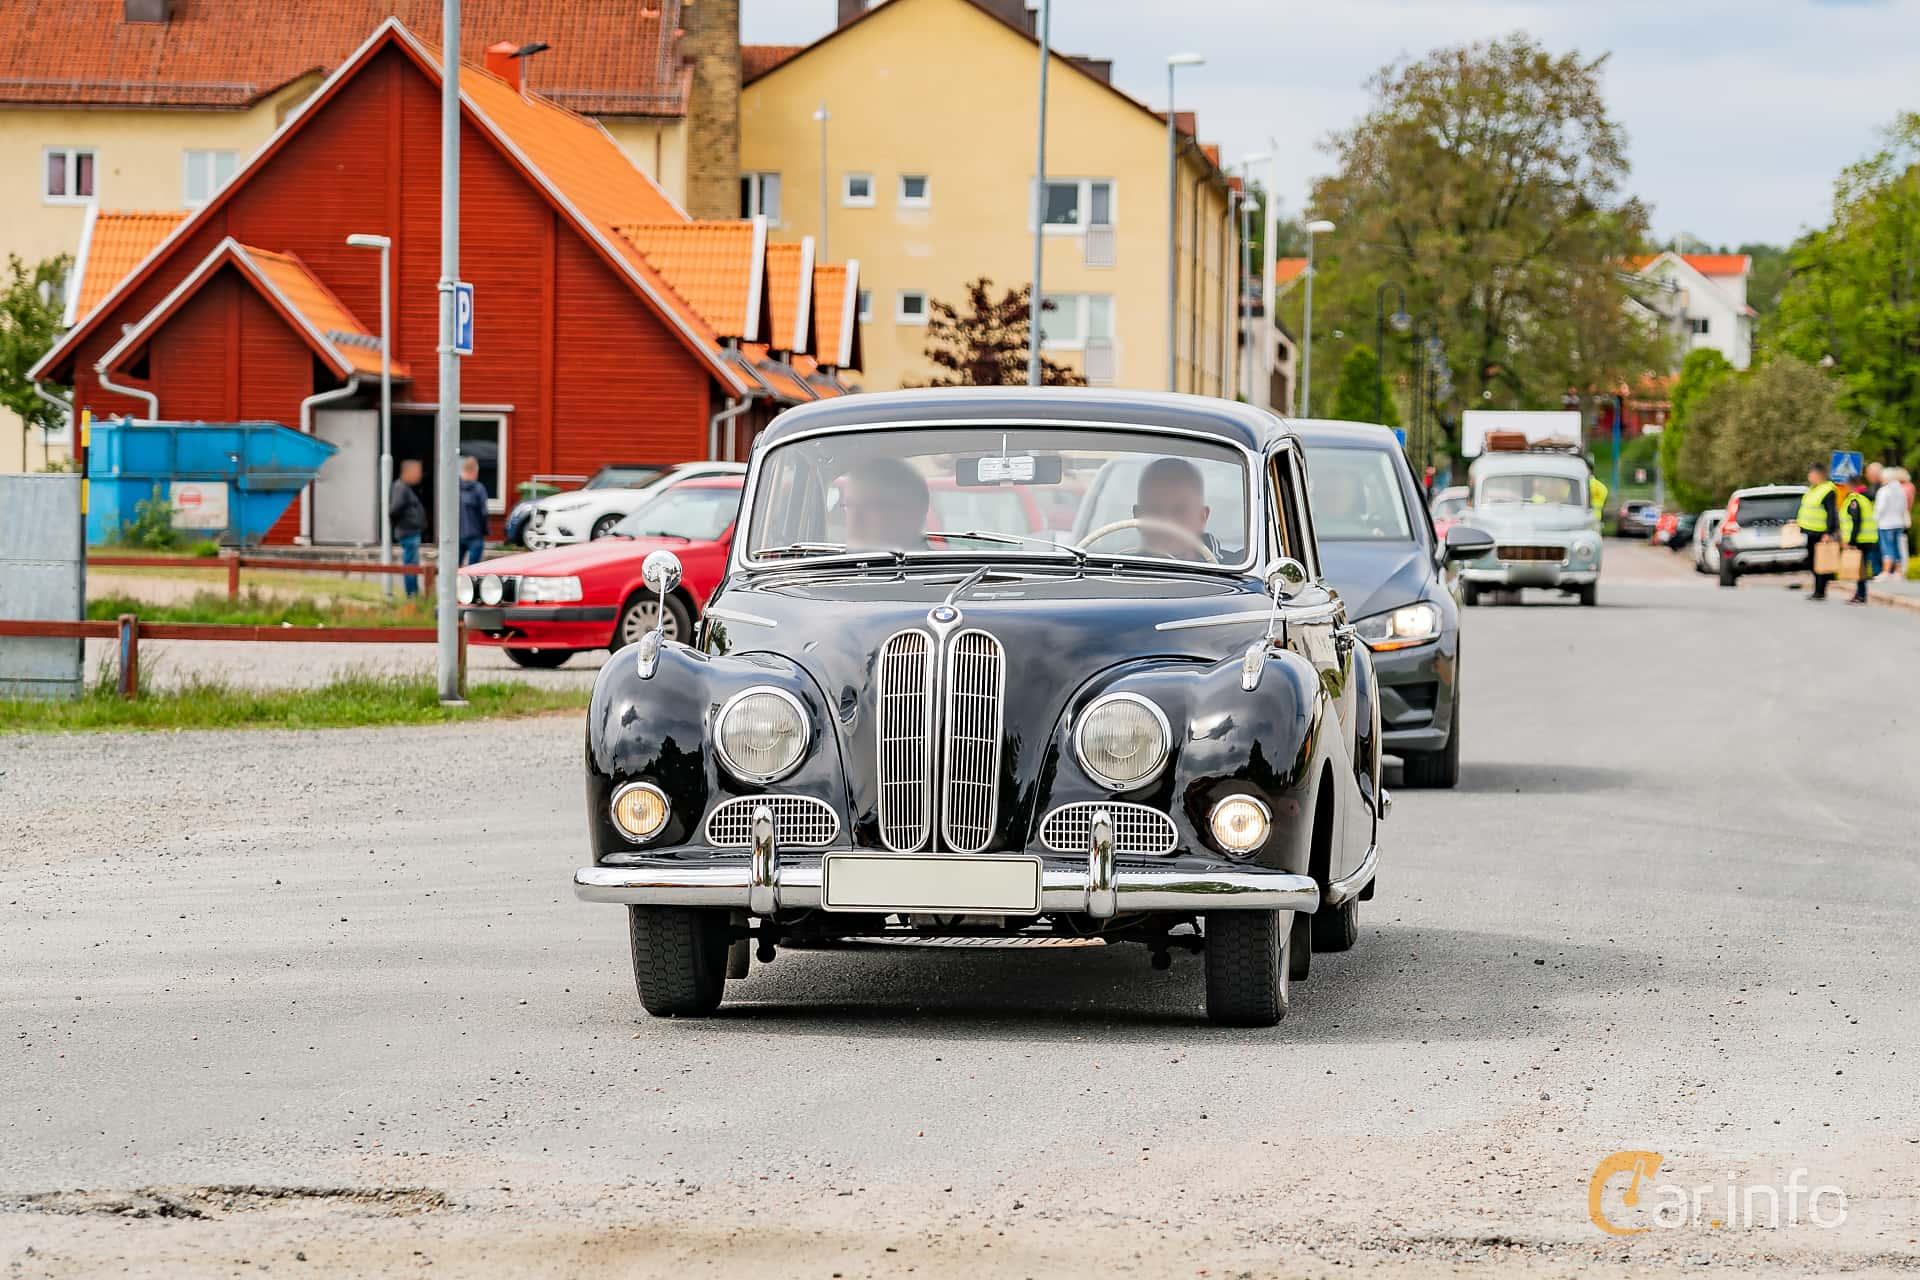 BMW 502 2.6 V8 Manual, 100hp, 1956 at Riksettanrallyt 2019 Skillingaryd